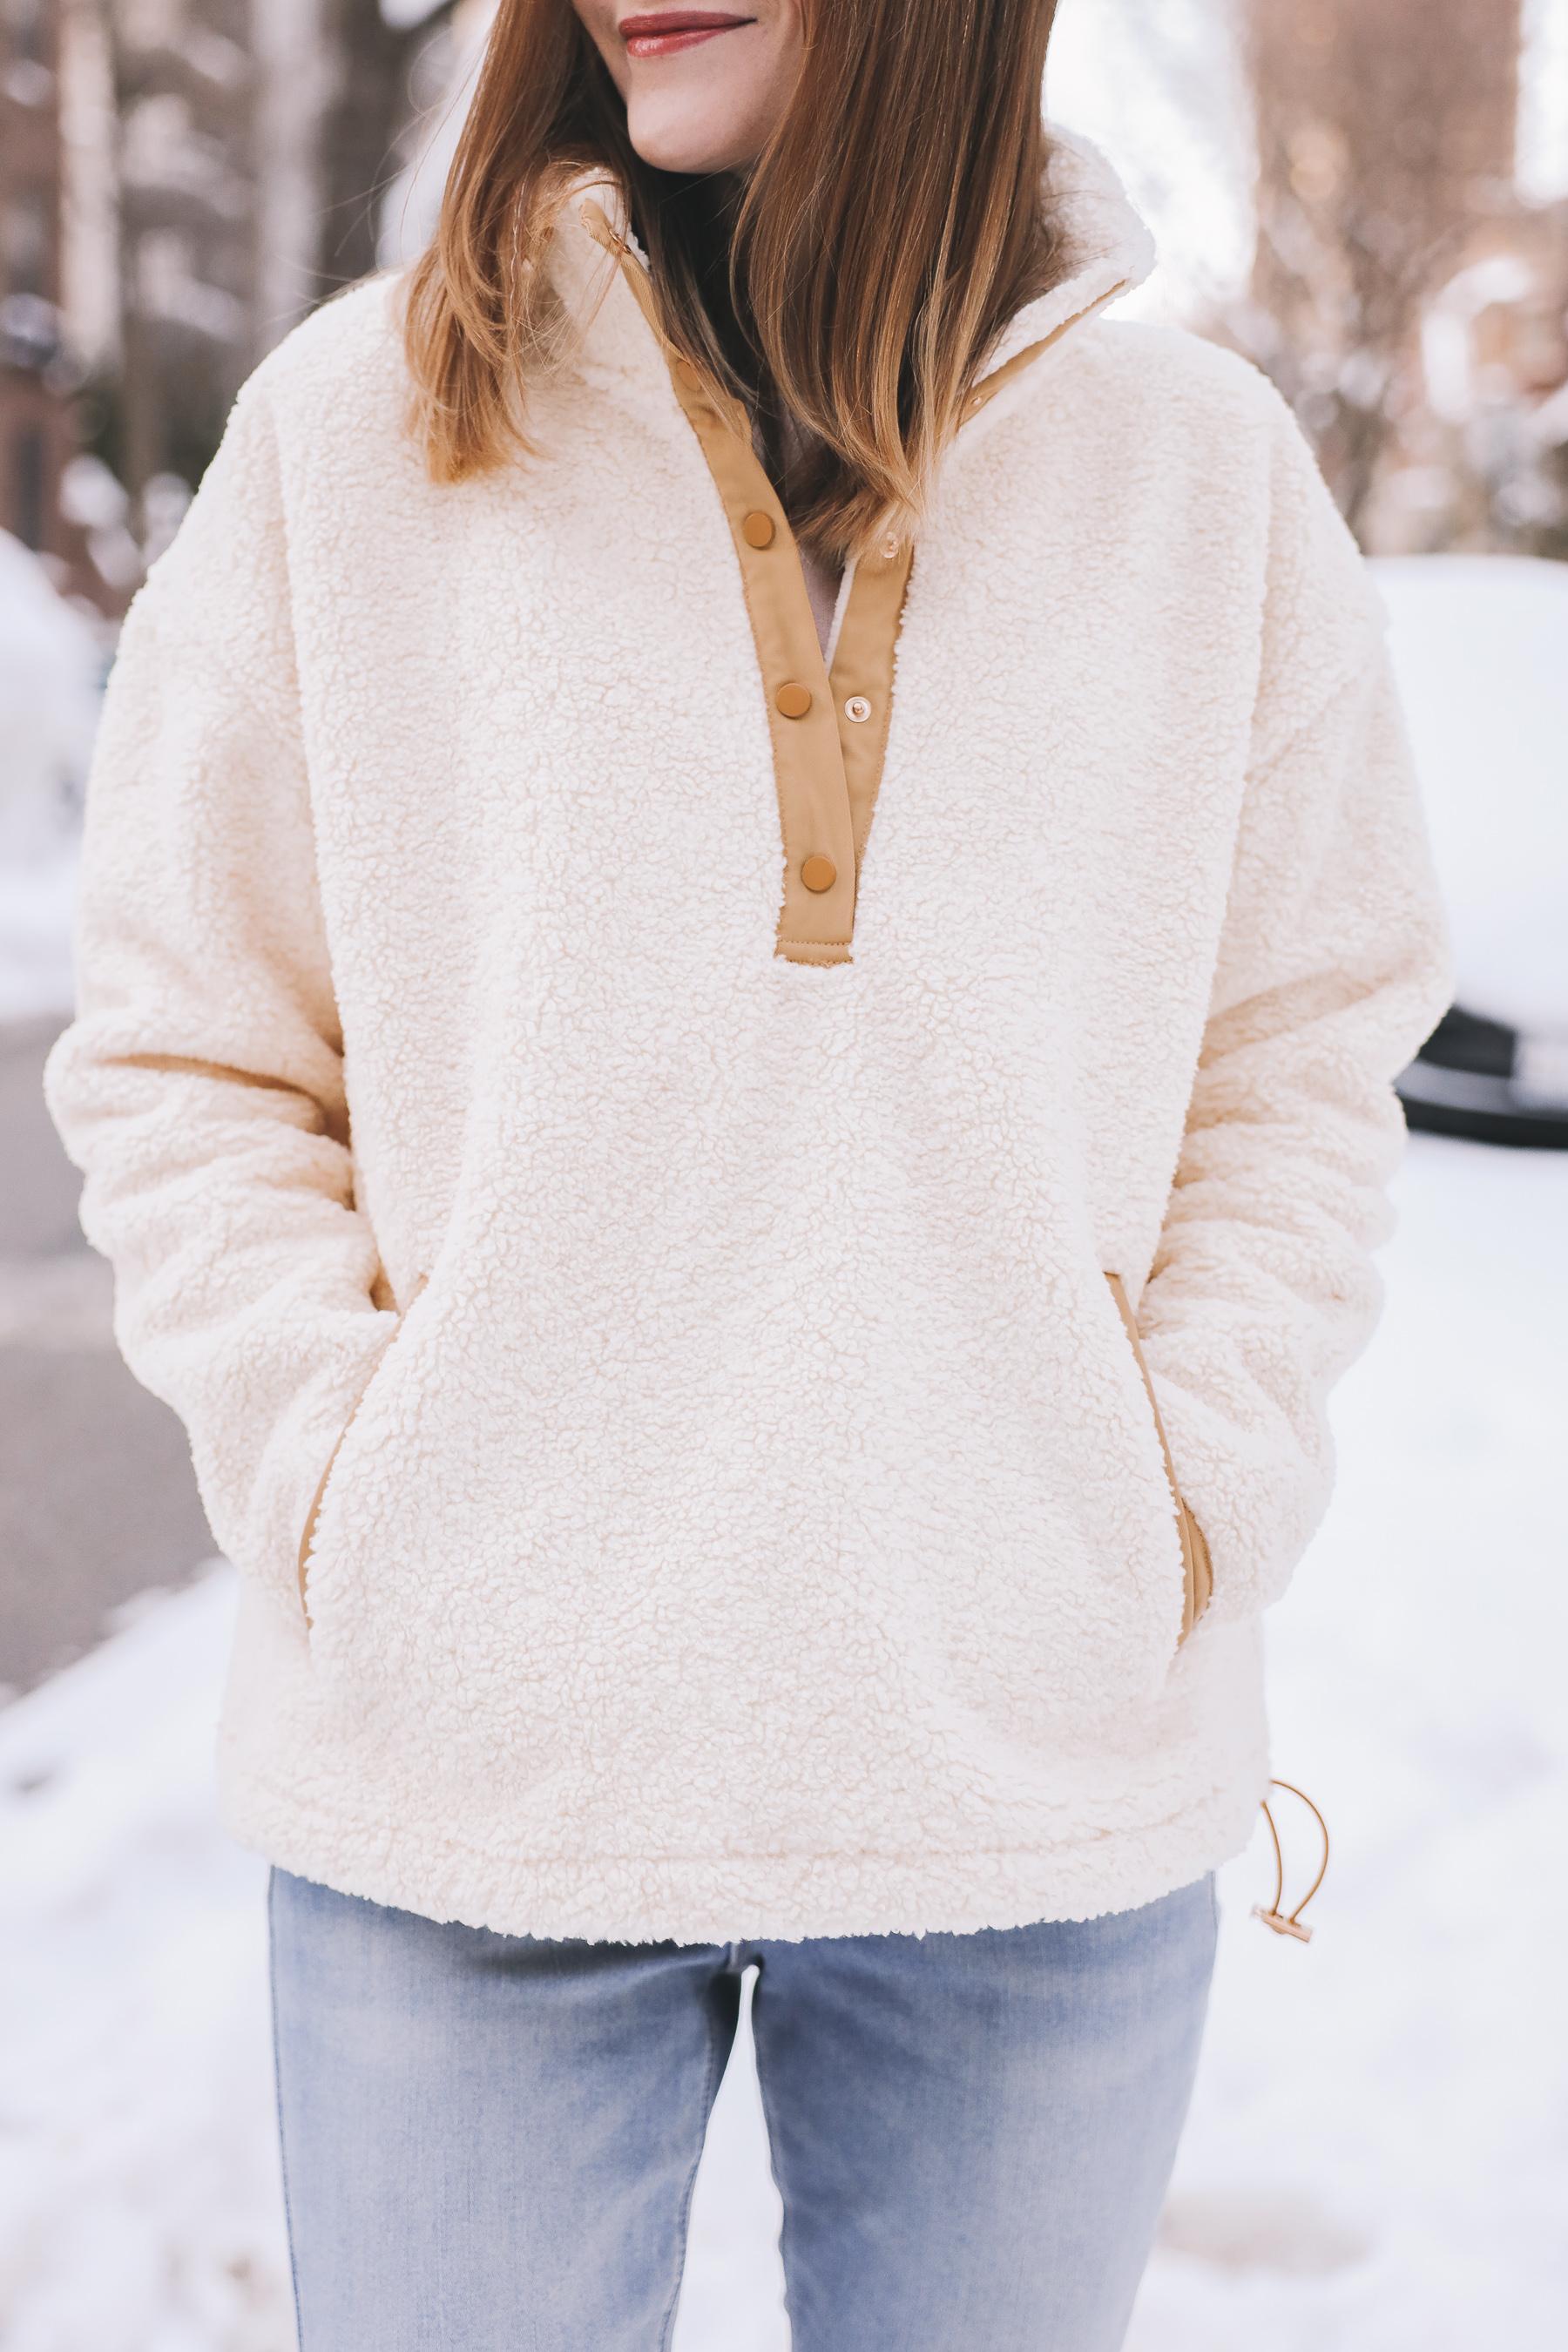 fleece jacket for winter